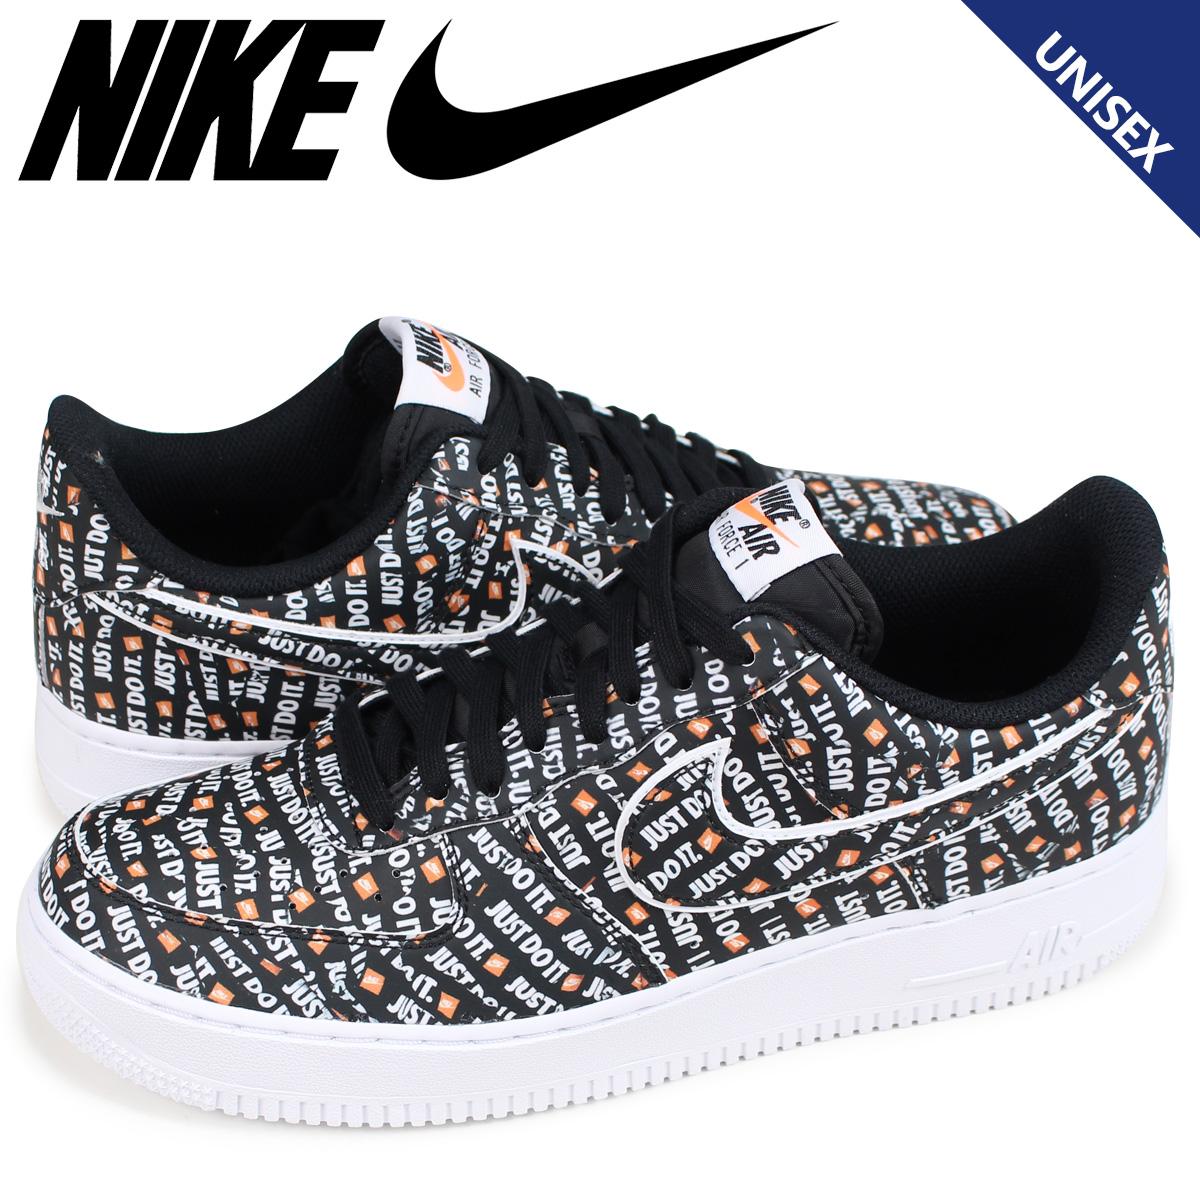 the best attitude 017cf 47e72 Nike NIKE air force 1 sneakers men gap Dis AIR FORCE 1 07 LV8 JUST DO ...